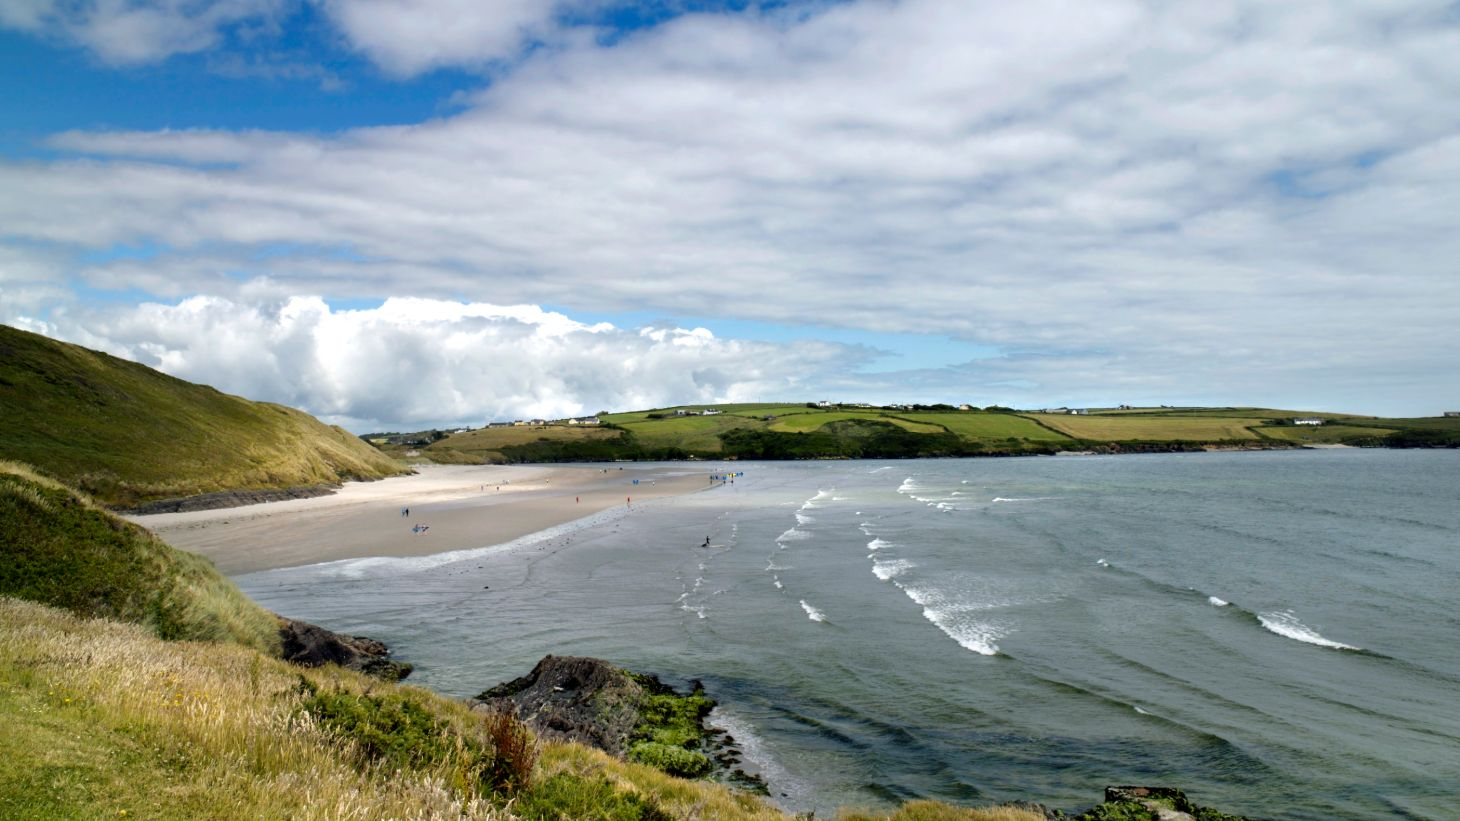 The beautiful Inchydoney Beach, Clonakilty, Co. Cork.